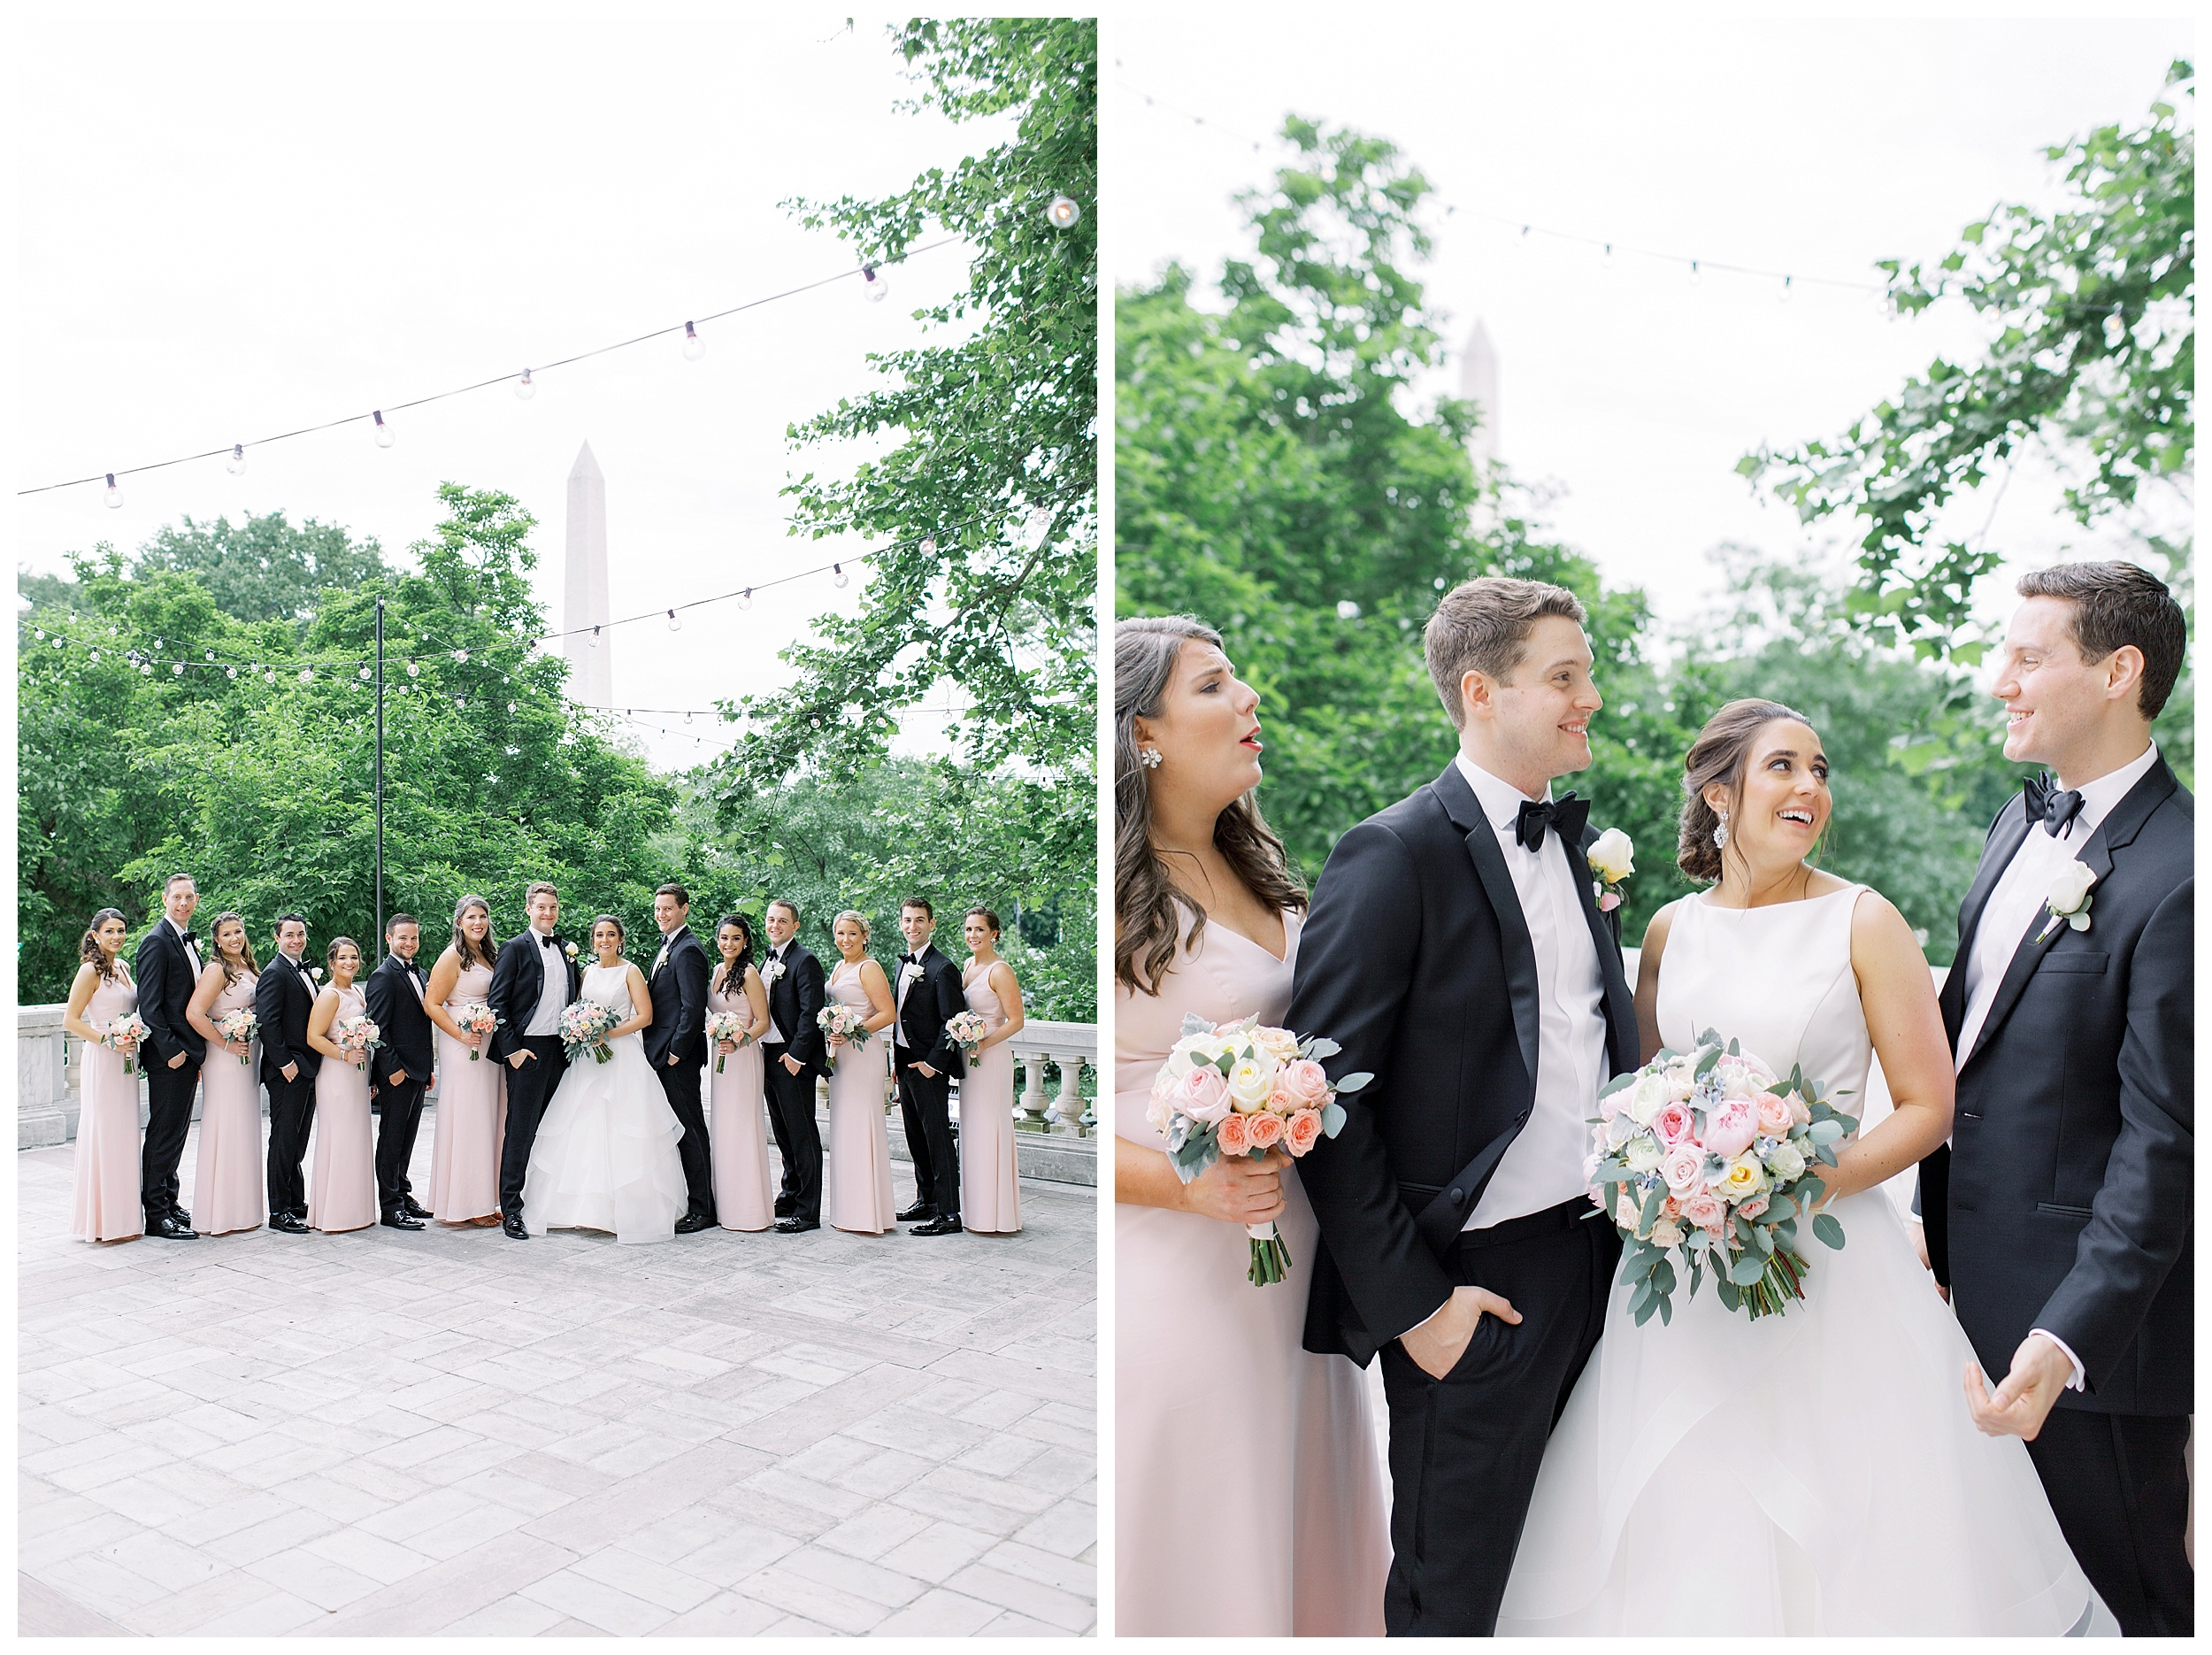 DAR Constitution Hall Wedding Wedding | Daughters of the American Revolution Wedding | District of Columbia Film Wedding Photographer Kir Tuben_0075.jpg